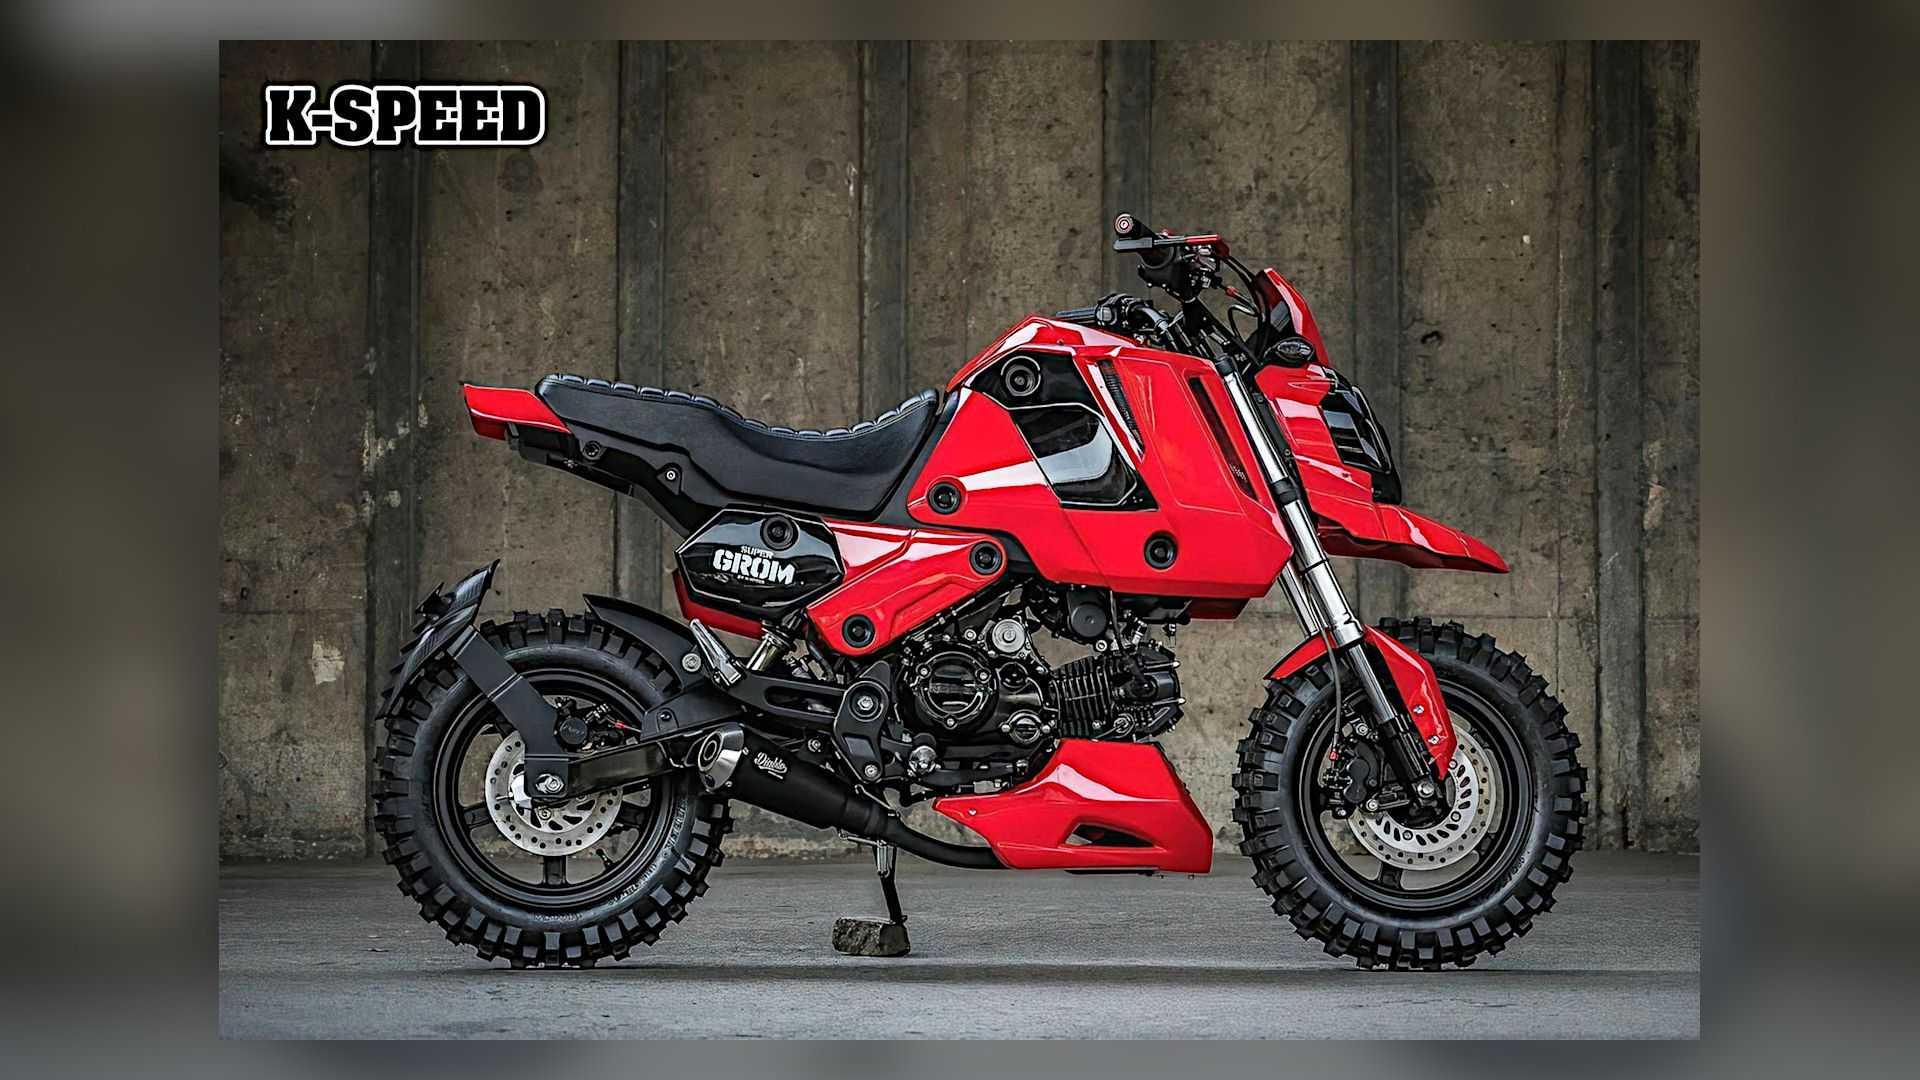 Стиль Adventure-grom для Honda MSX125 |  К-Speed Custom Super Grom